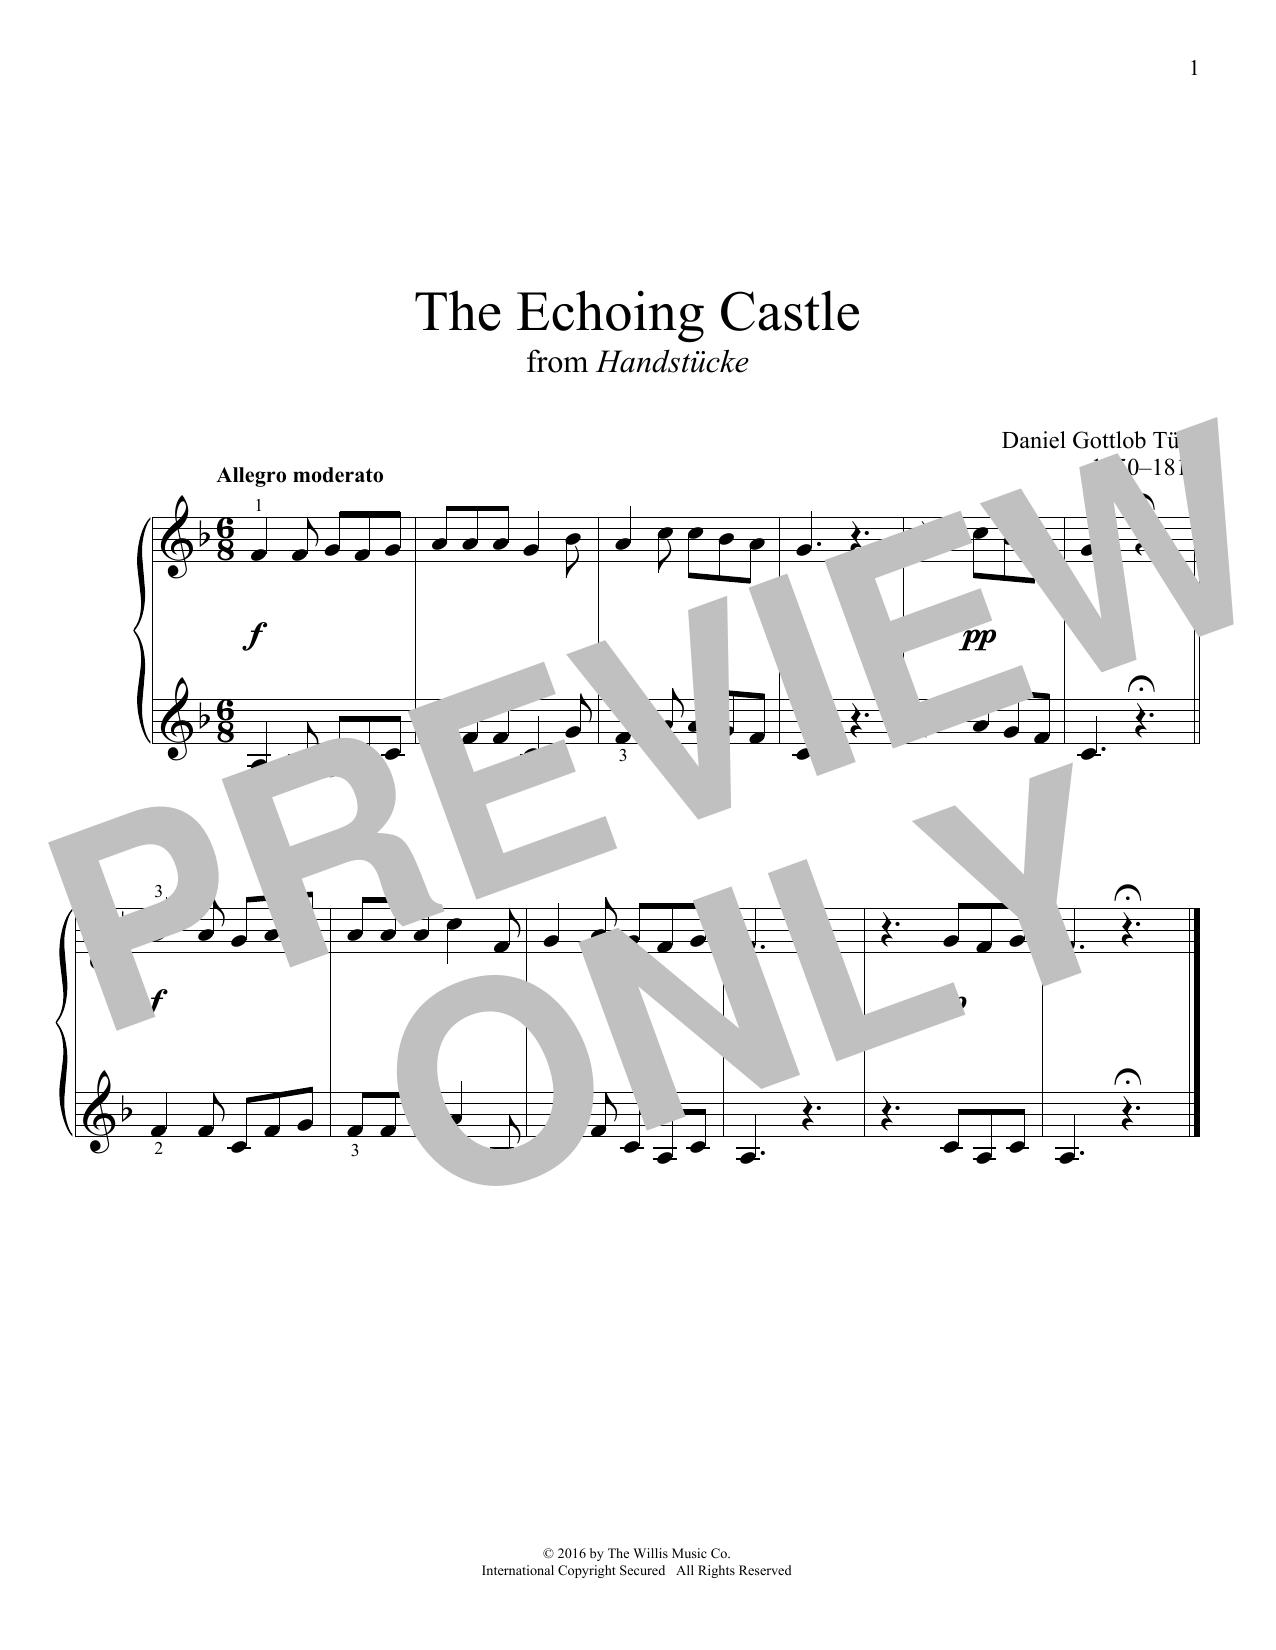 Daniel Gottlob Türk The Echoing Castle sheet music notes and chords. Download Printable PDF.